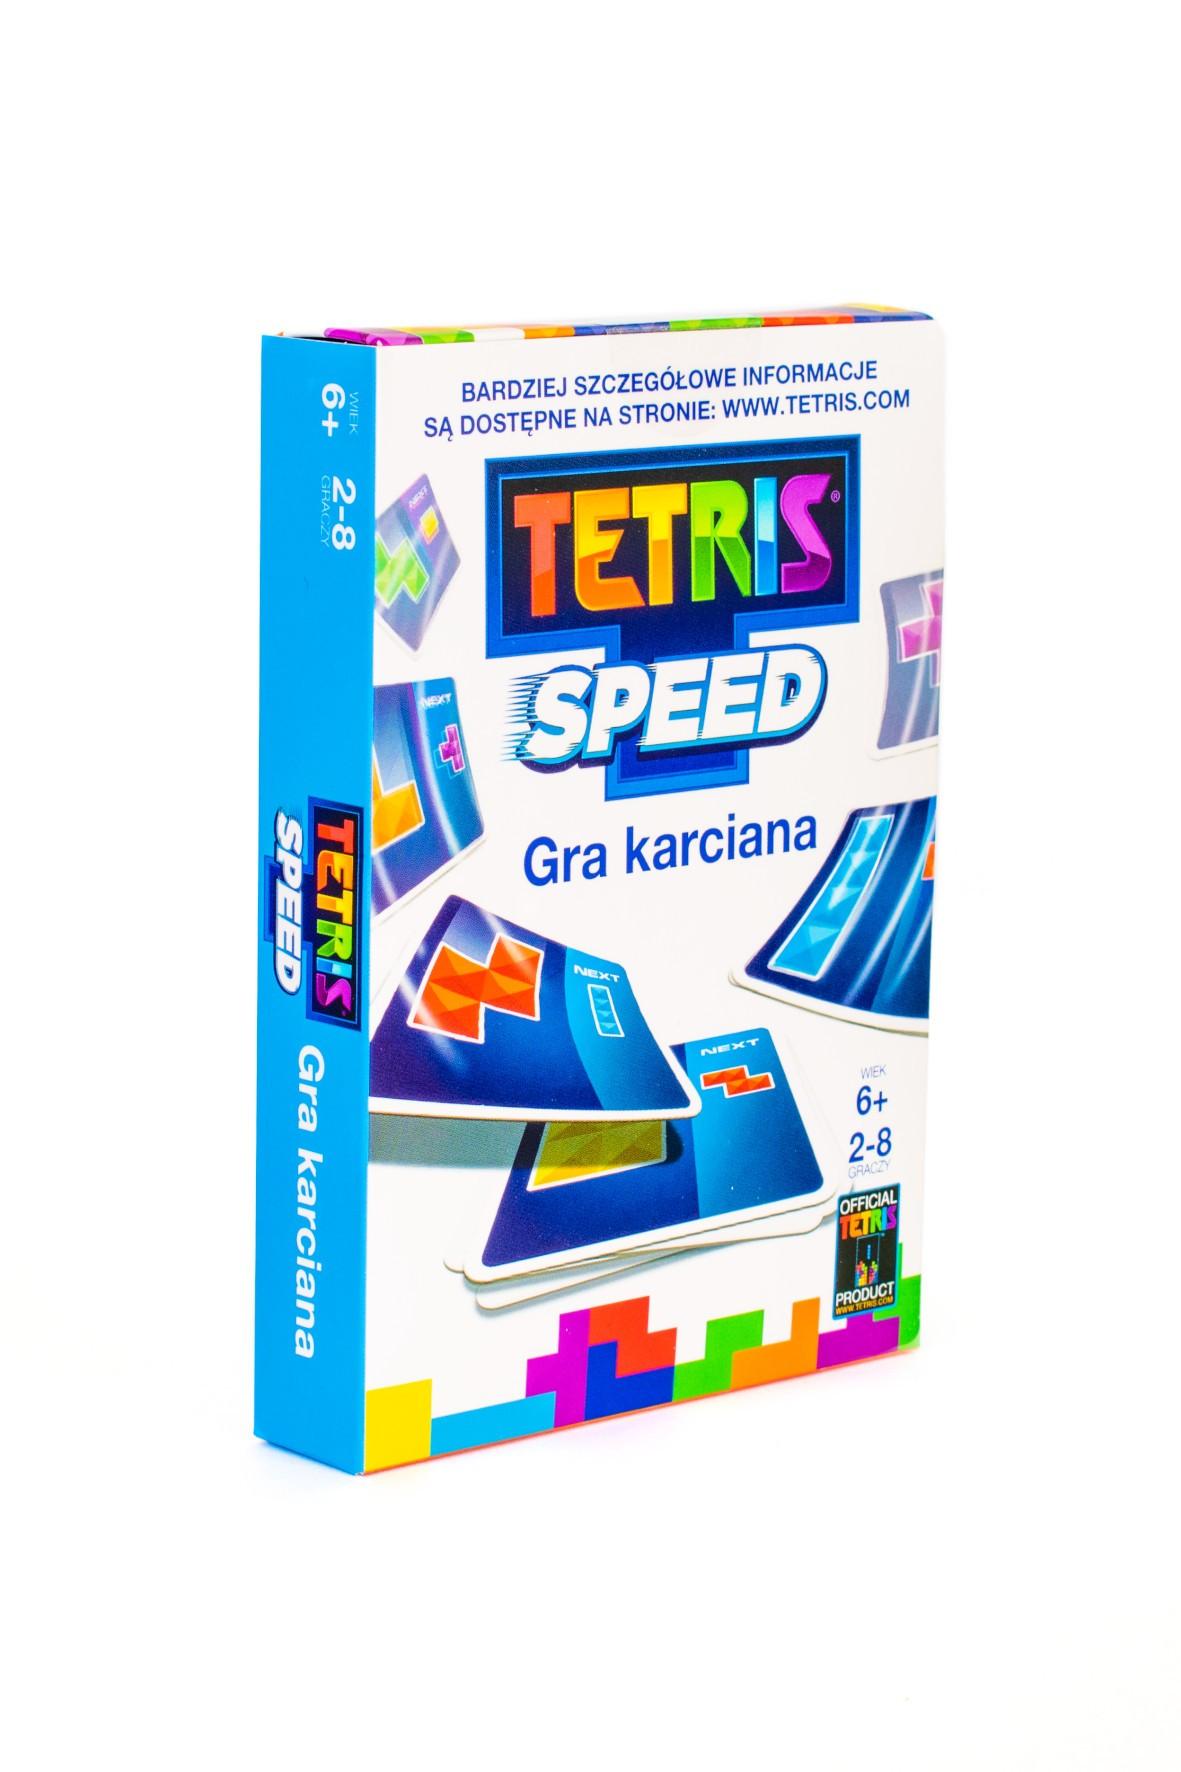 Tetris Speed Gra karciana wiek 6+